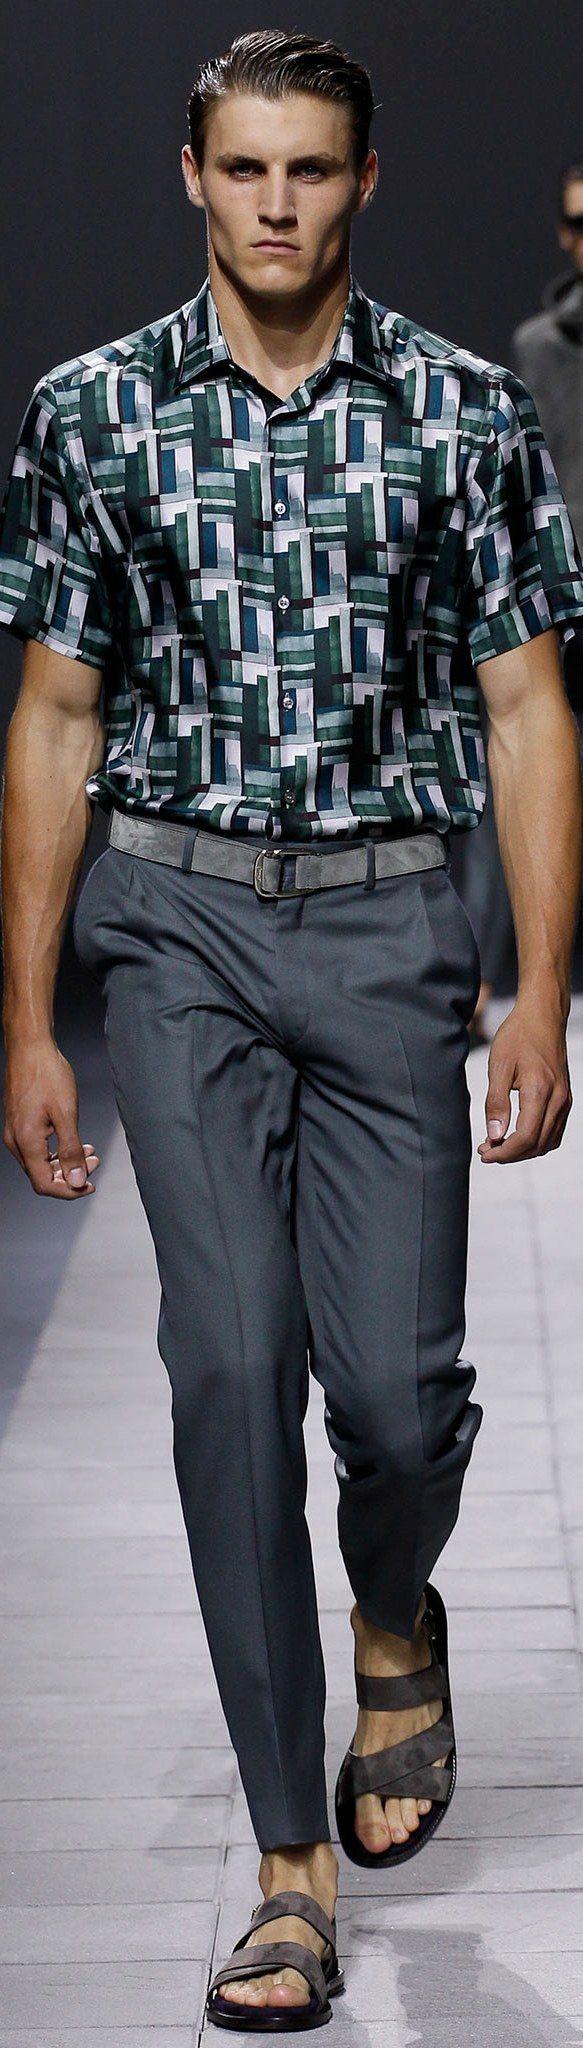 Brioni  Menswear  Spring   Italian Men's Fashion & Style   Luxury Casual   Moda Masculina   Shop at designerclothingfans.com